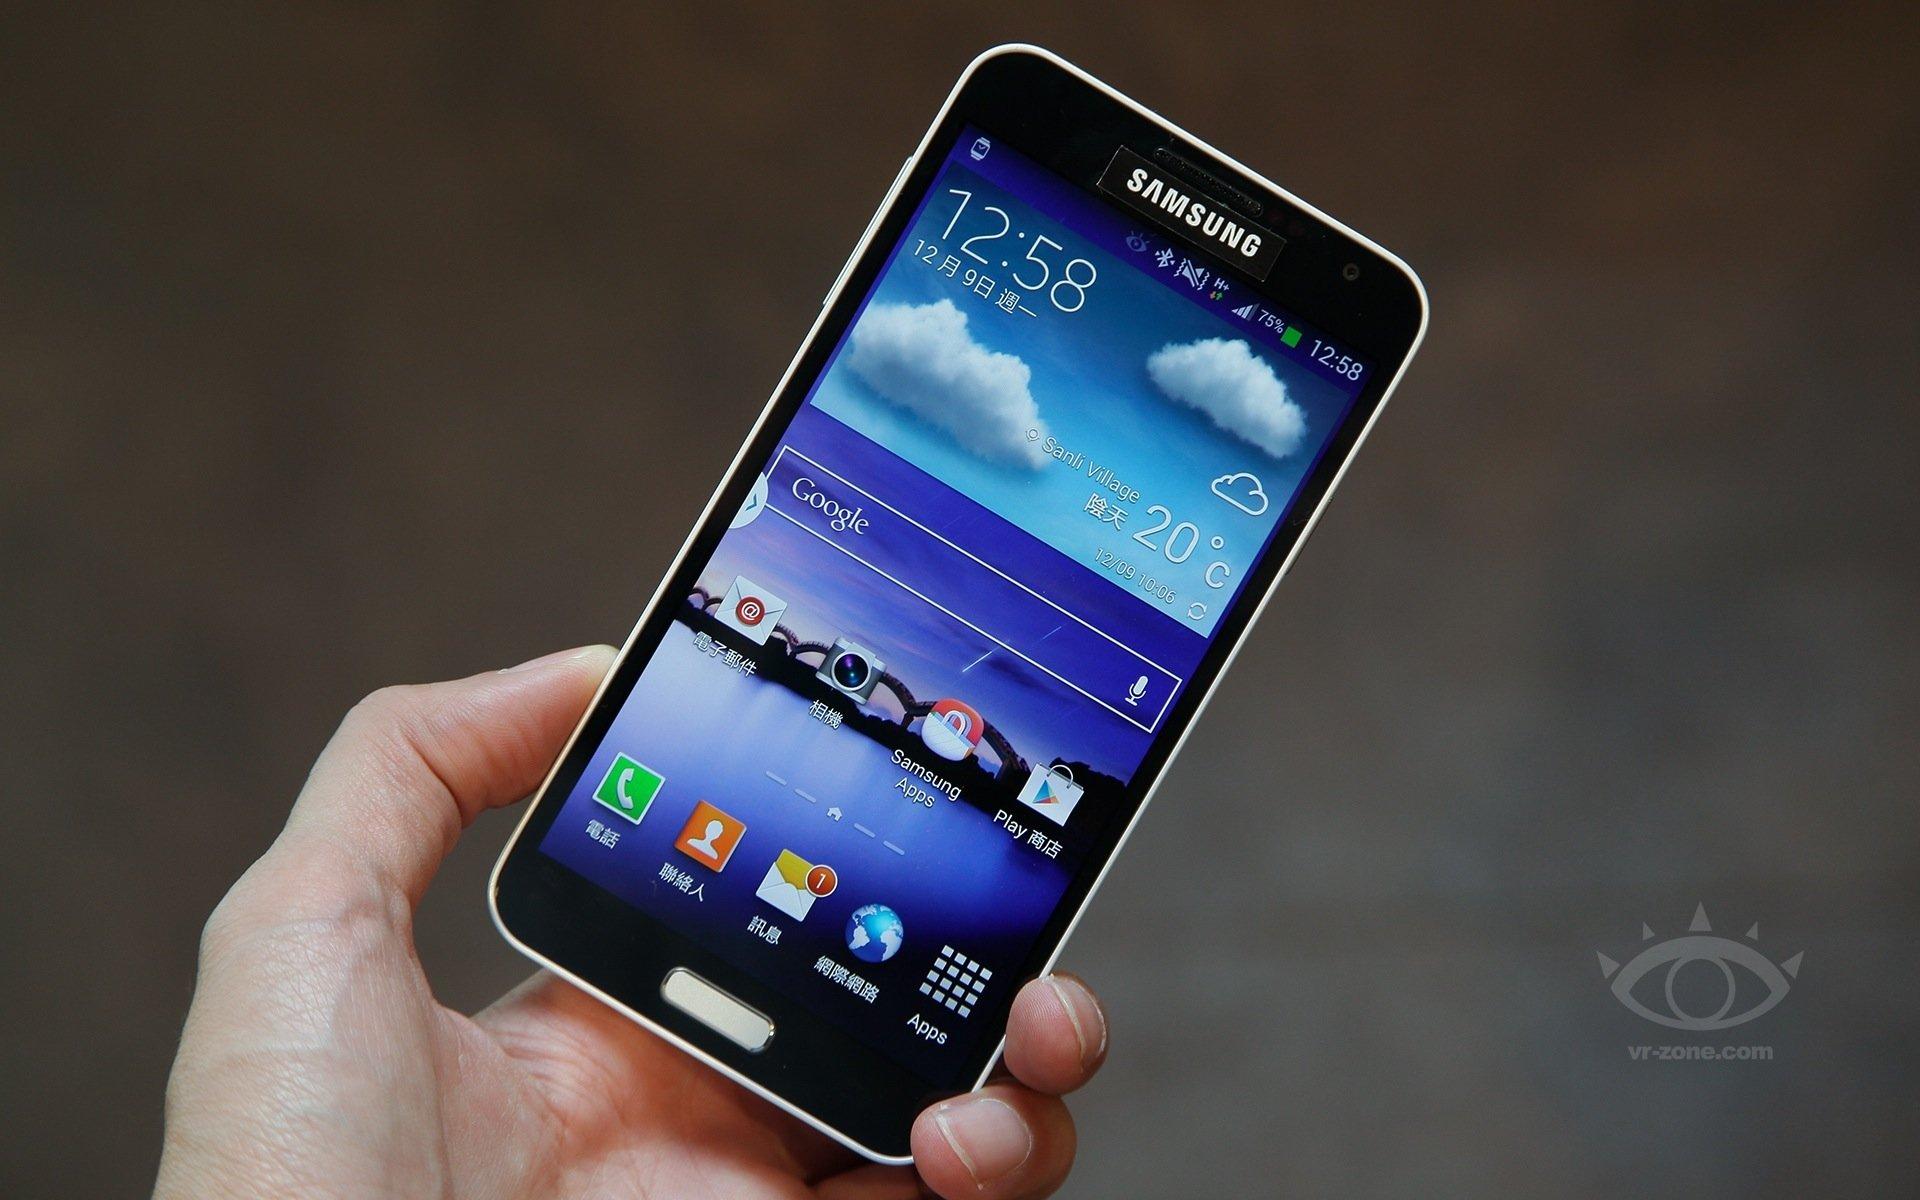 Samsung galaxy j 1 sm-j100fn - 90